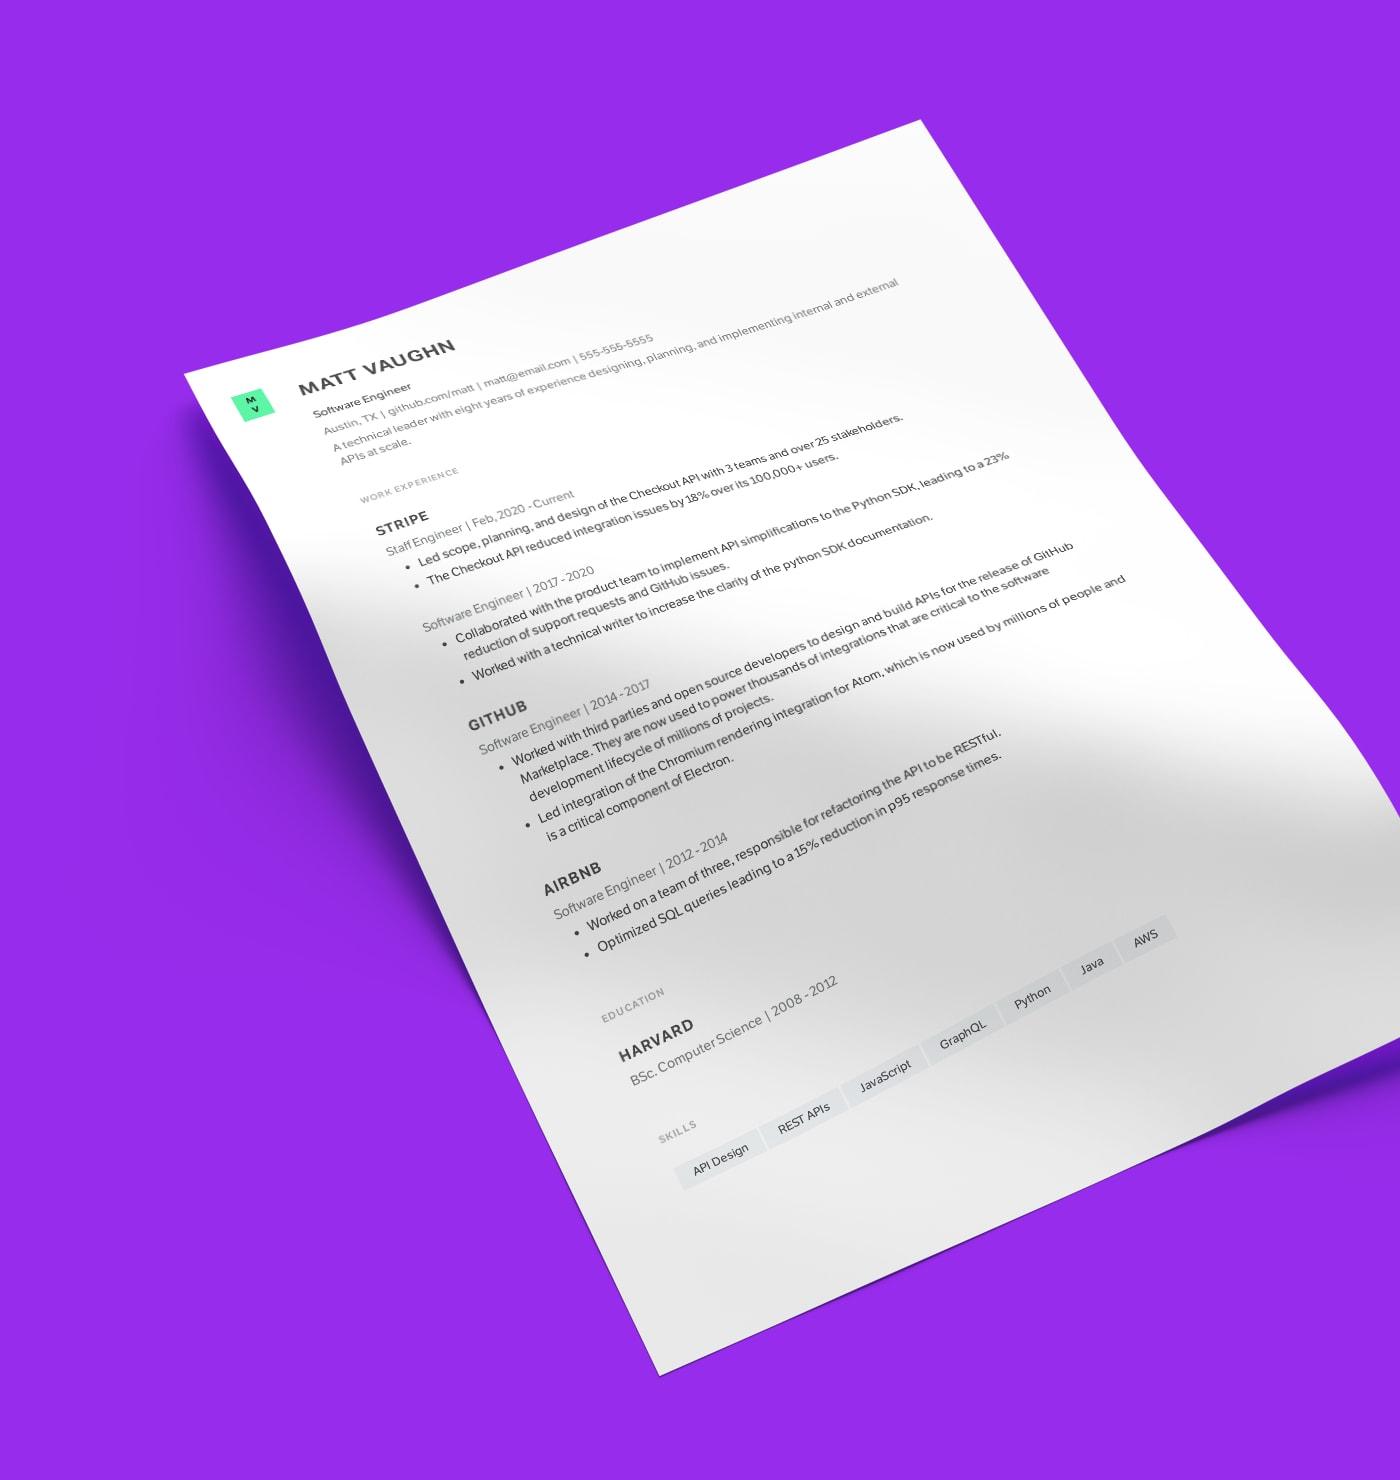 Sidney modern resume template made with Standard Resume builder.